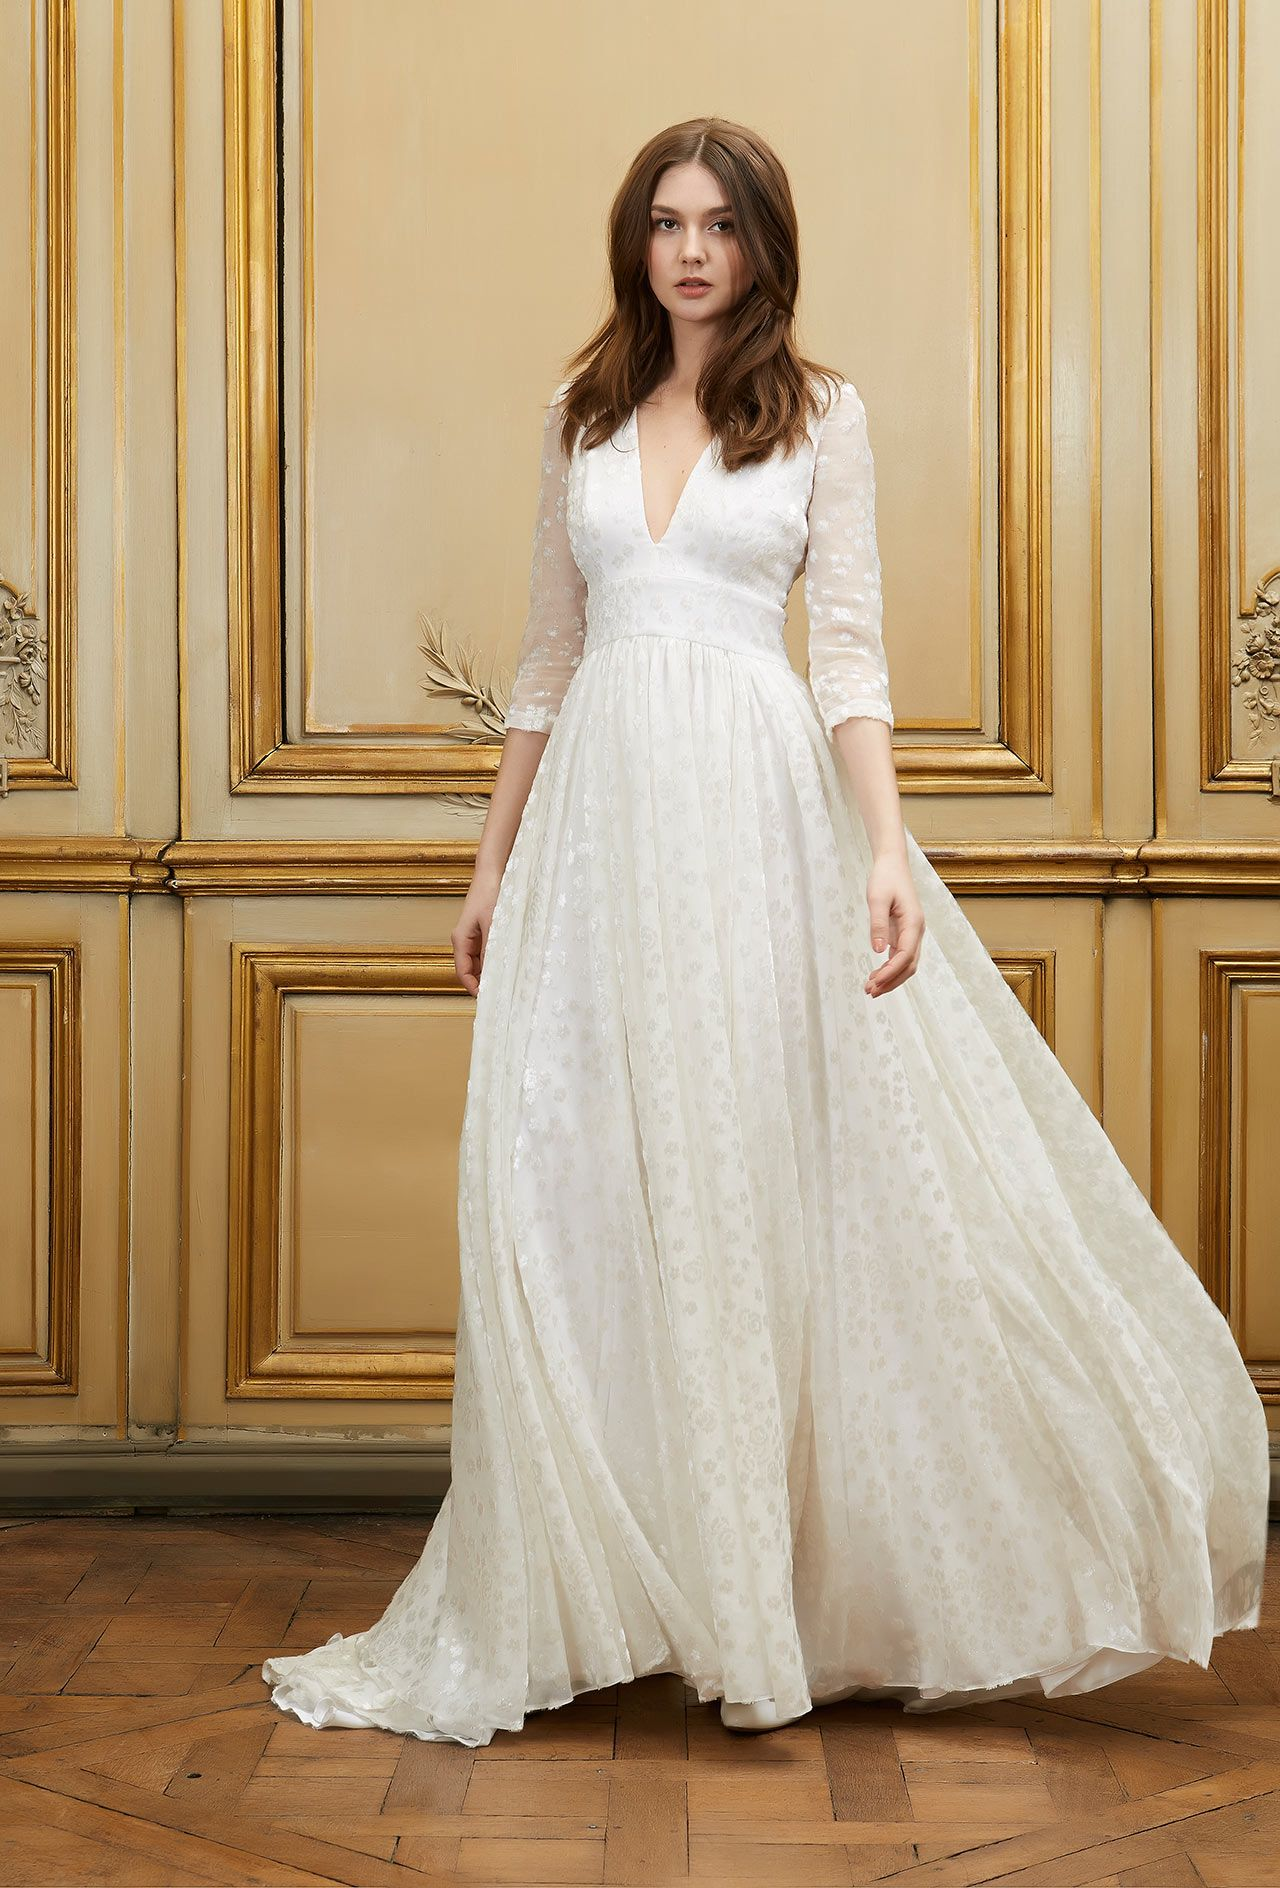 Delphine manivet wedding dress designer paris ozgur white delphine manivet wedding dress designer paris ozgur white long dress with deep v ombrellifo Image collections